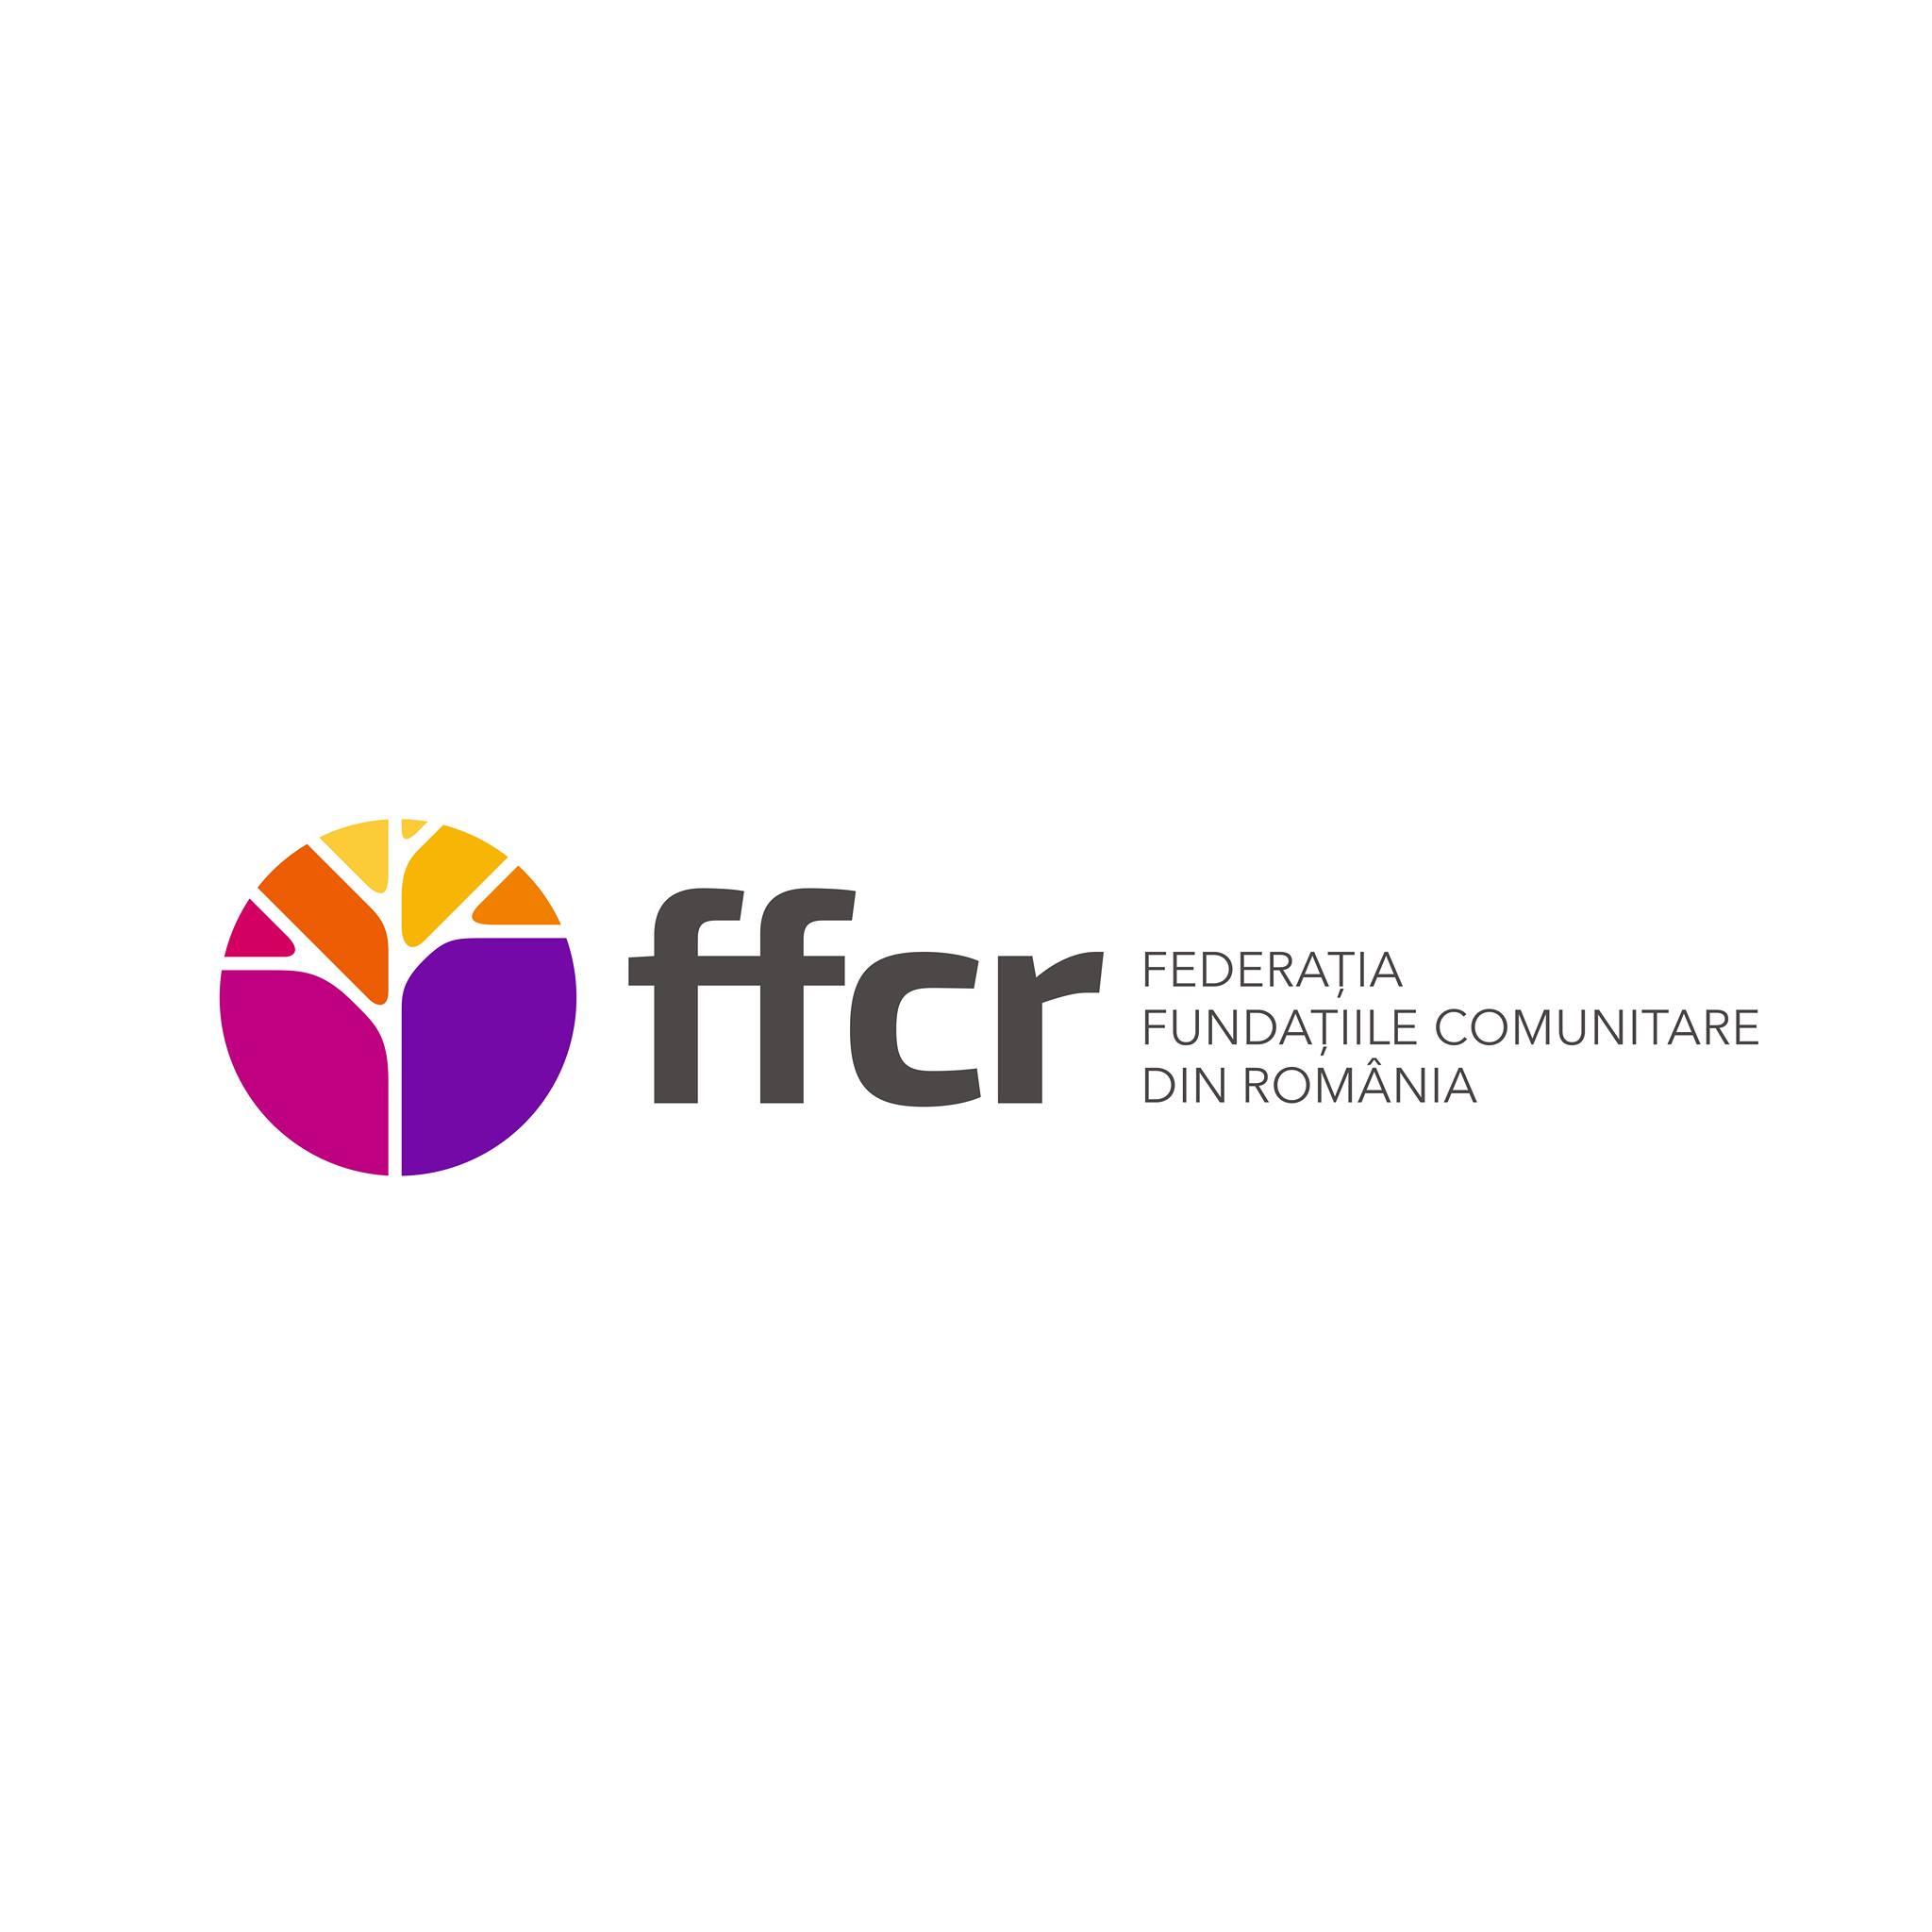 Federația Fundațiile Comunitare din România  logo